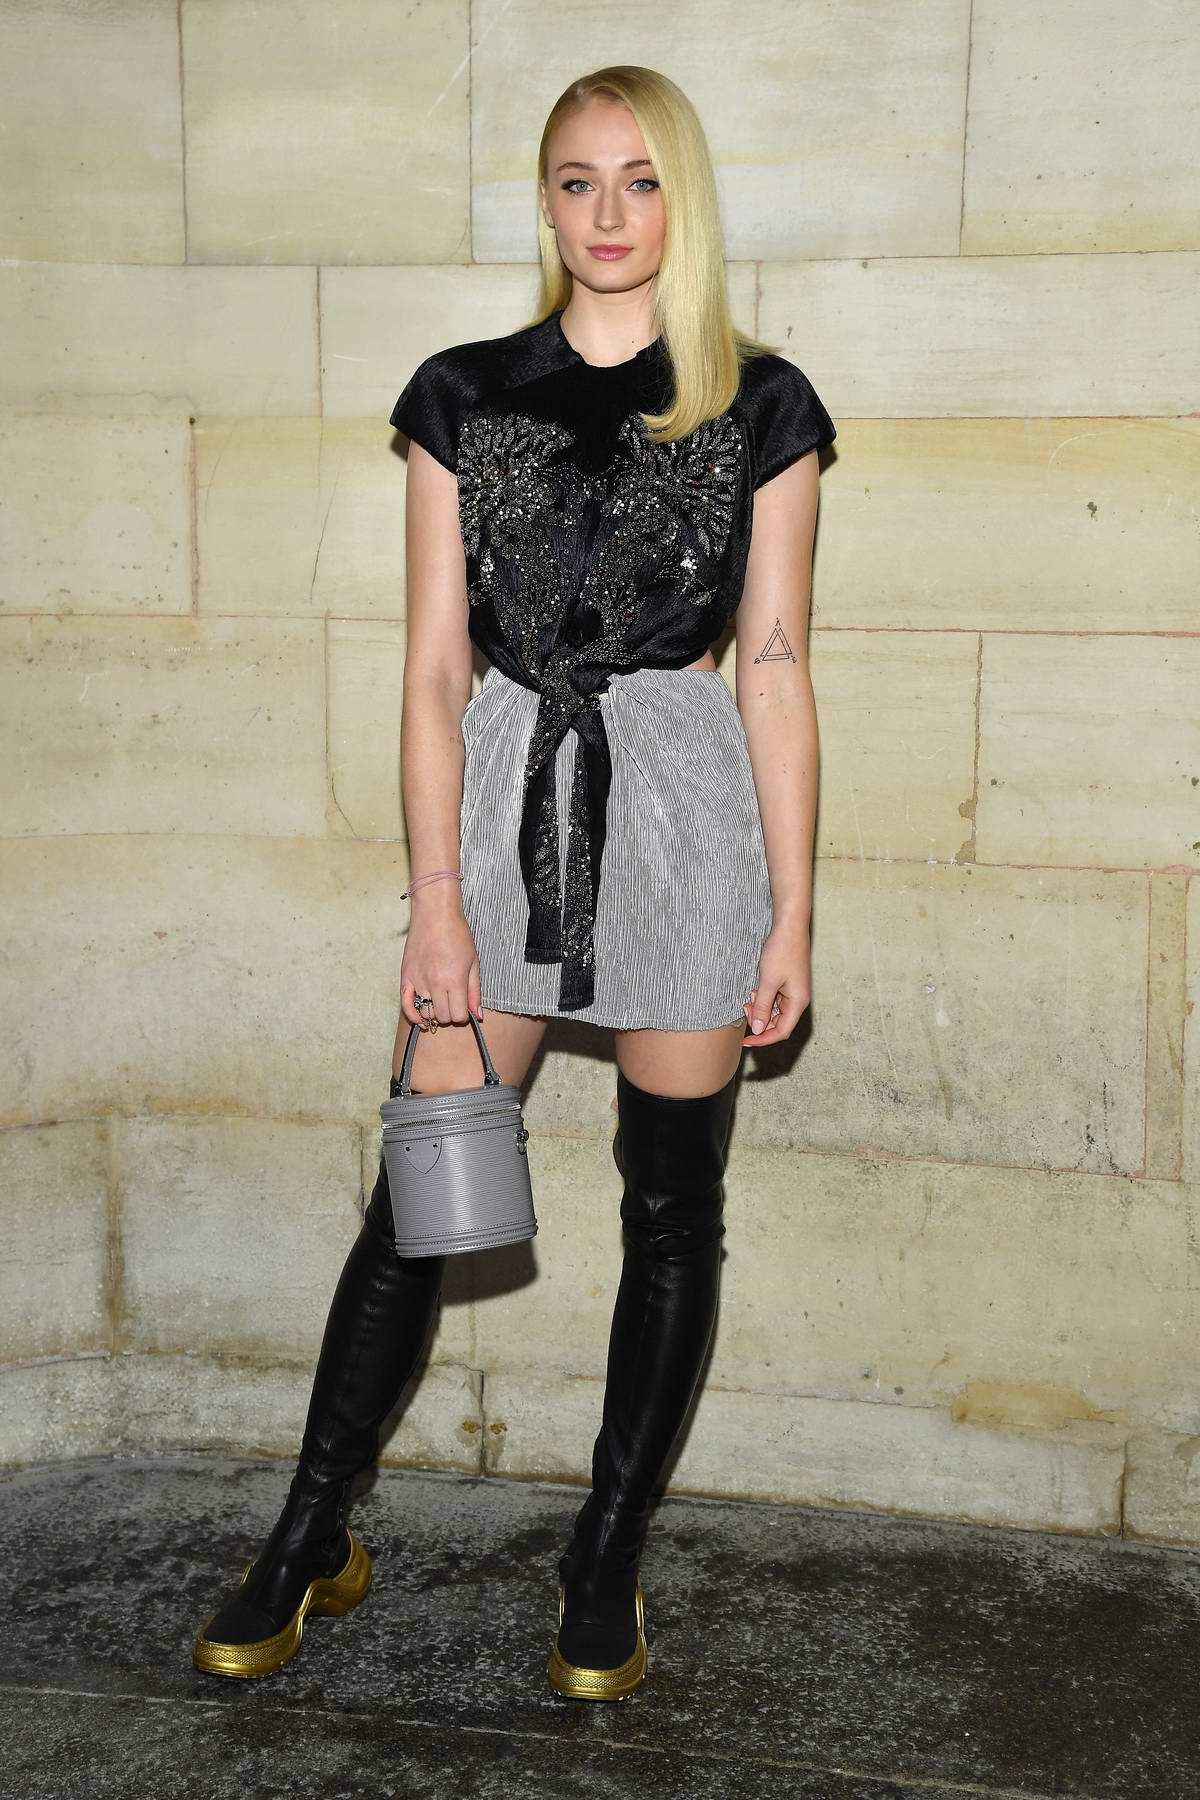 Sophie Turner attending the Louis Vuitton show during Paris Fashion Week in Paris, France